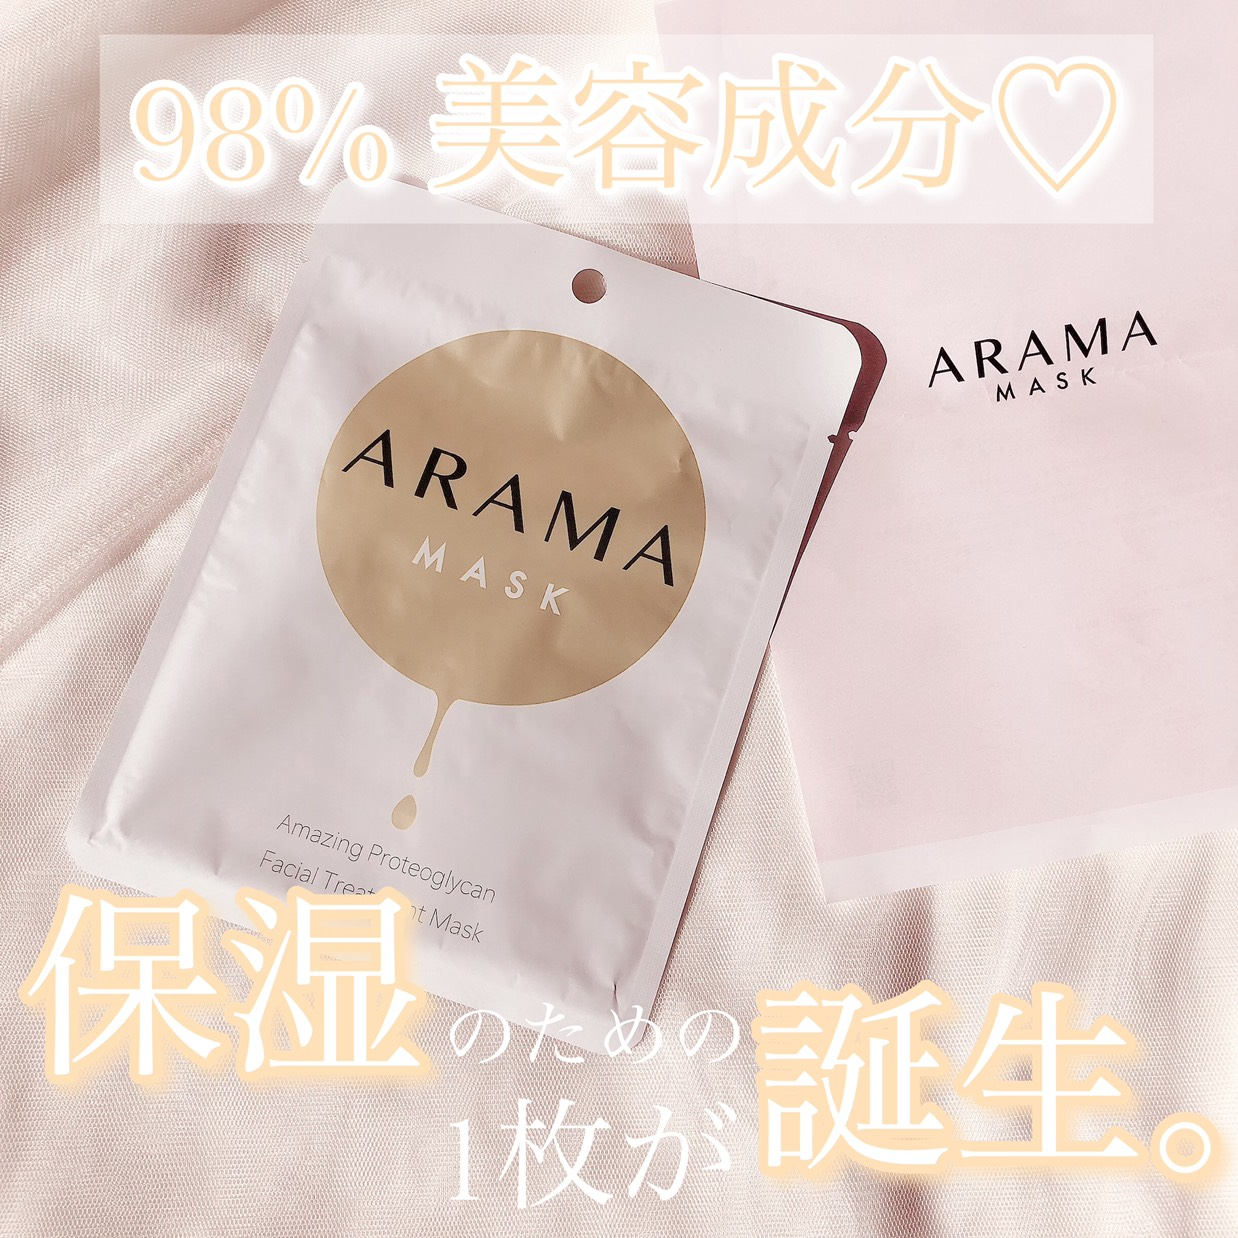 Arama Mask❤︎